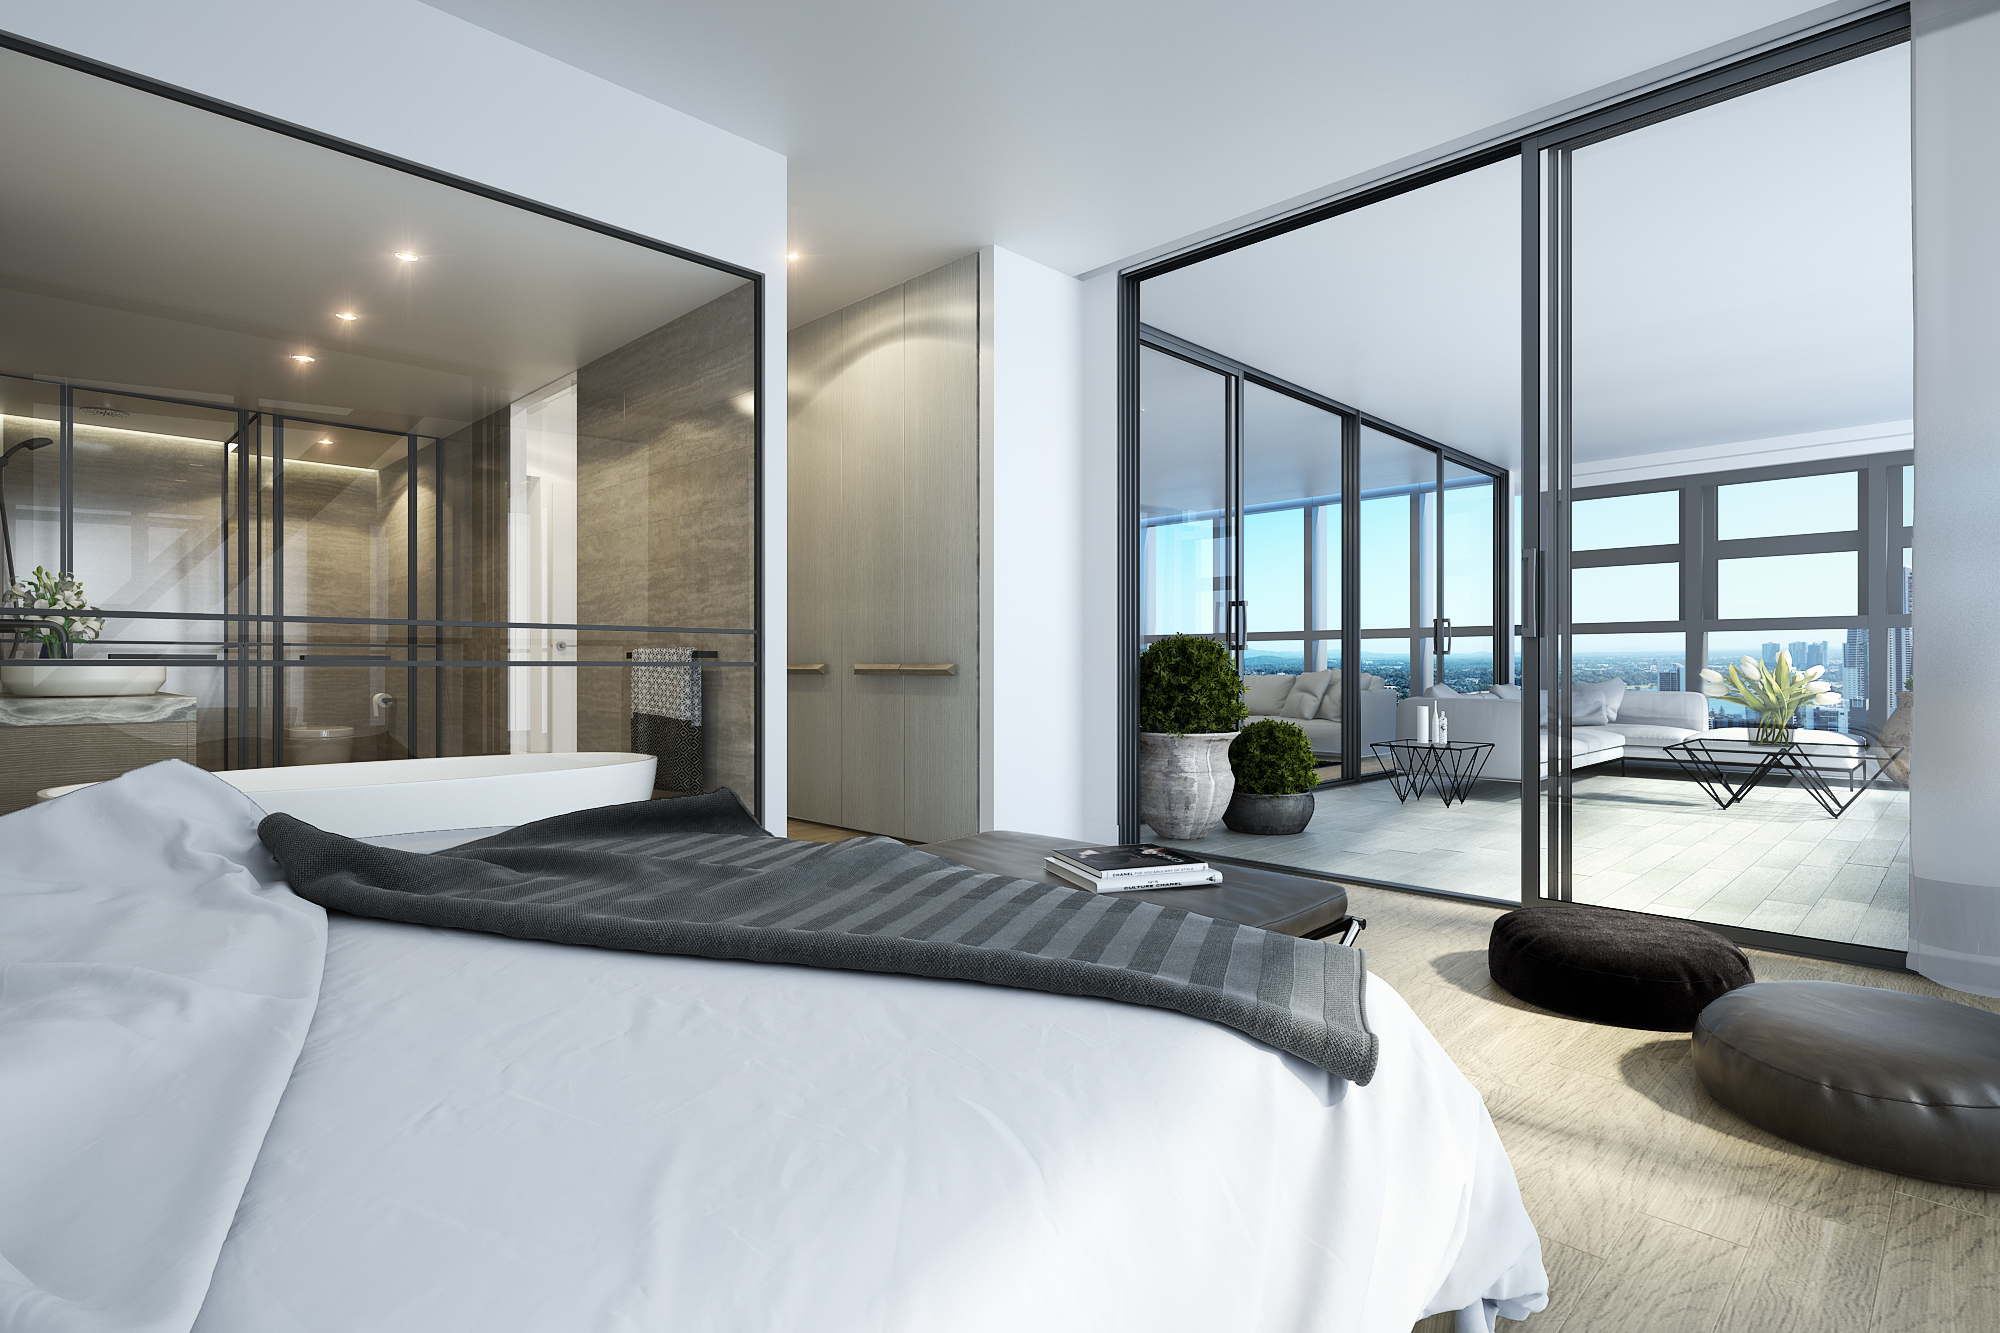 interior - bed a